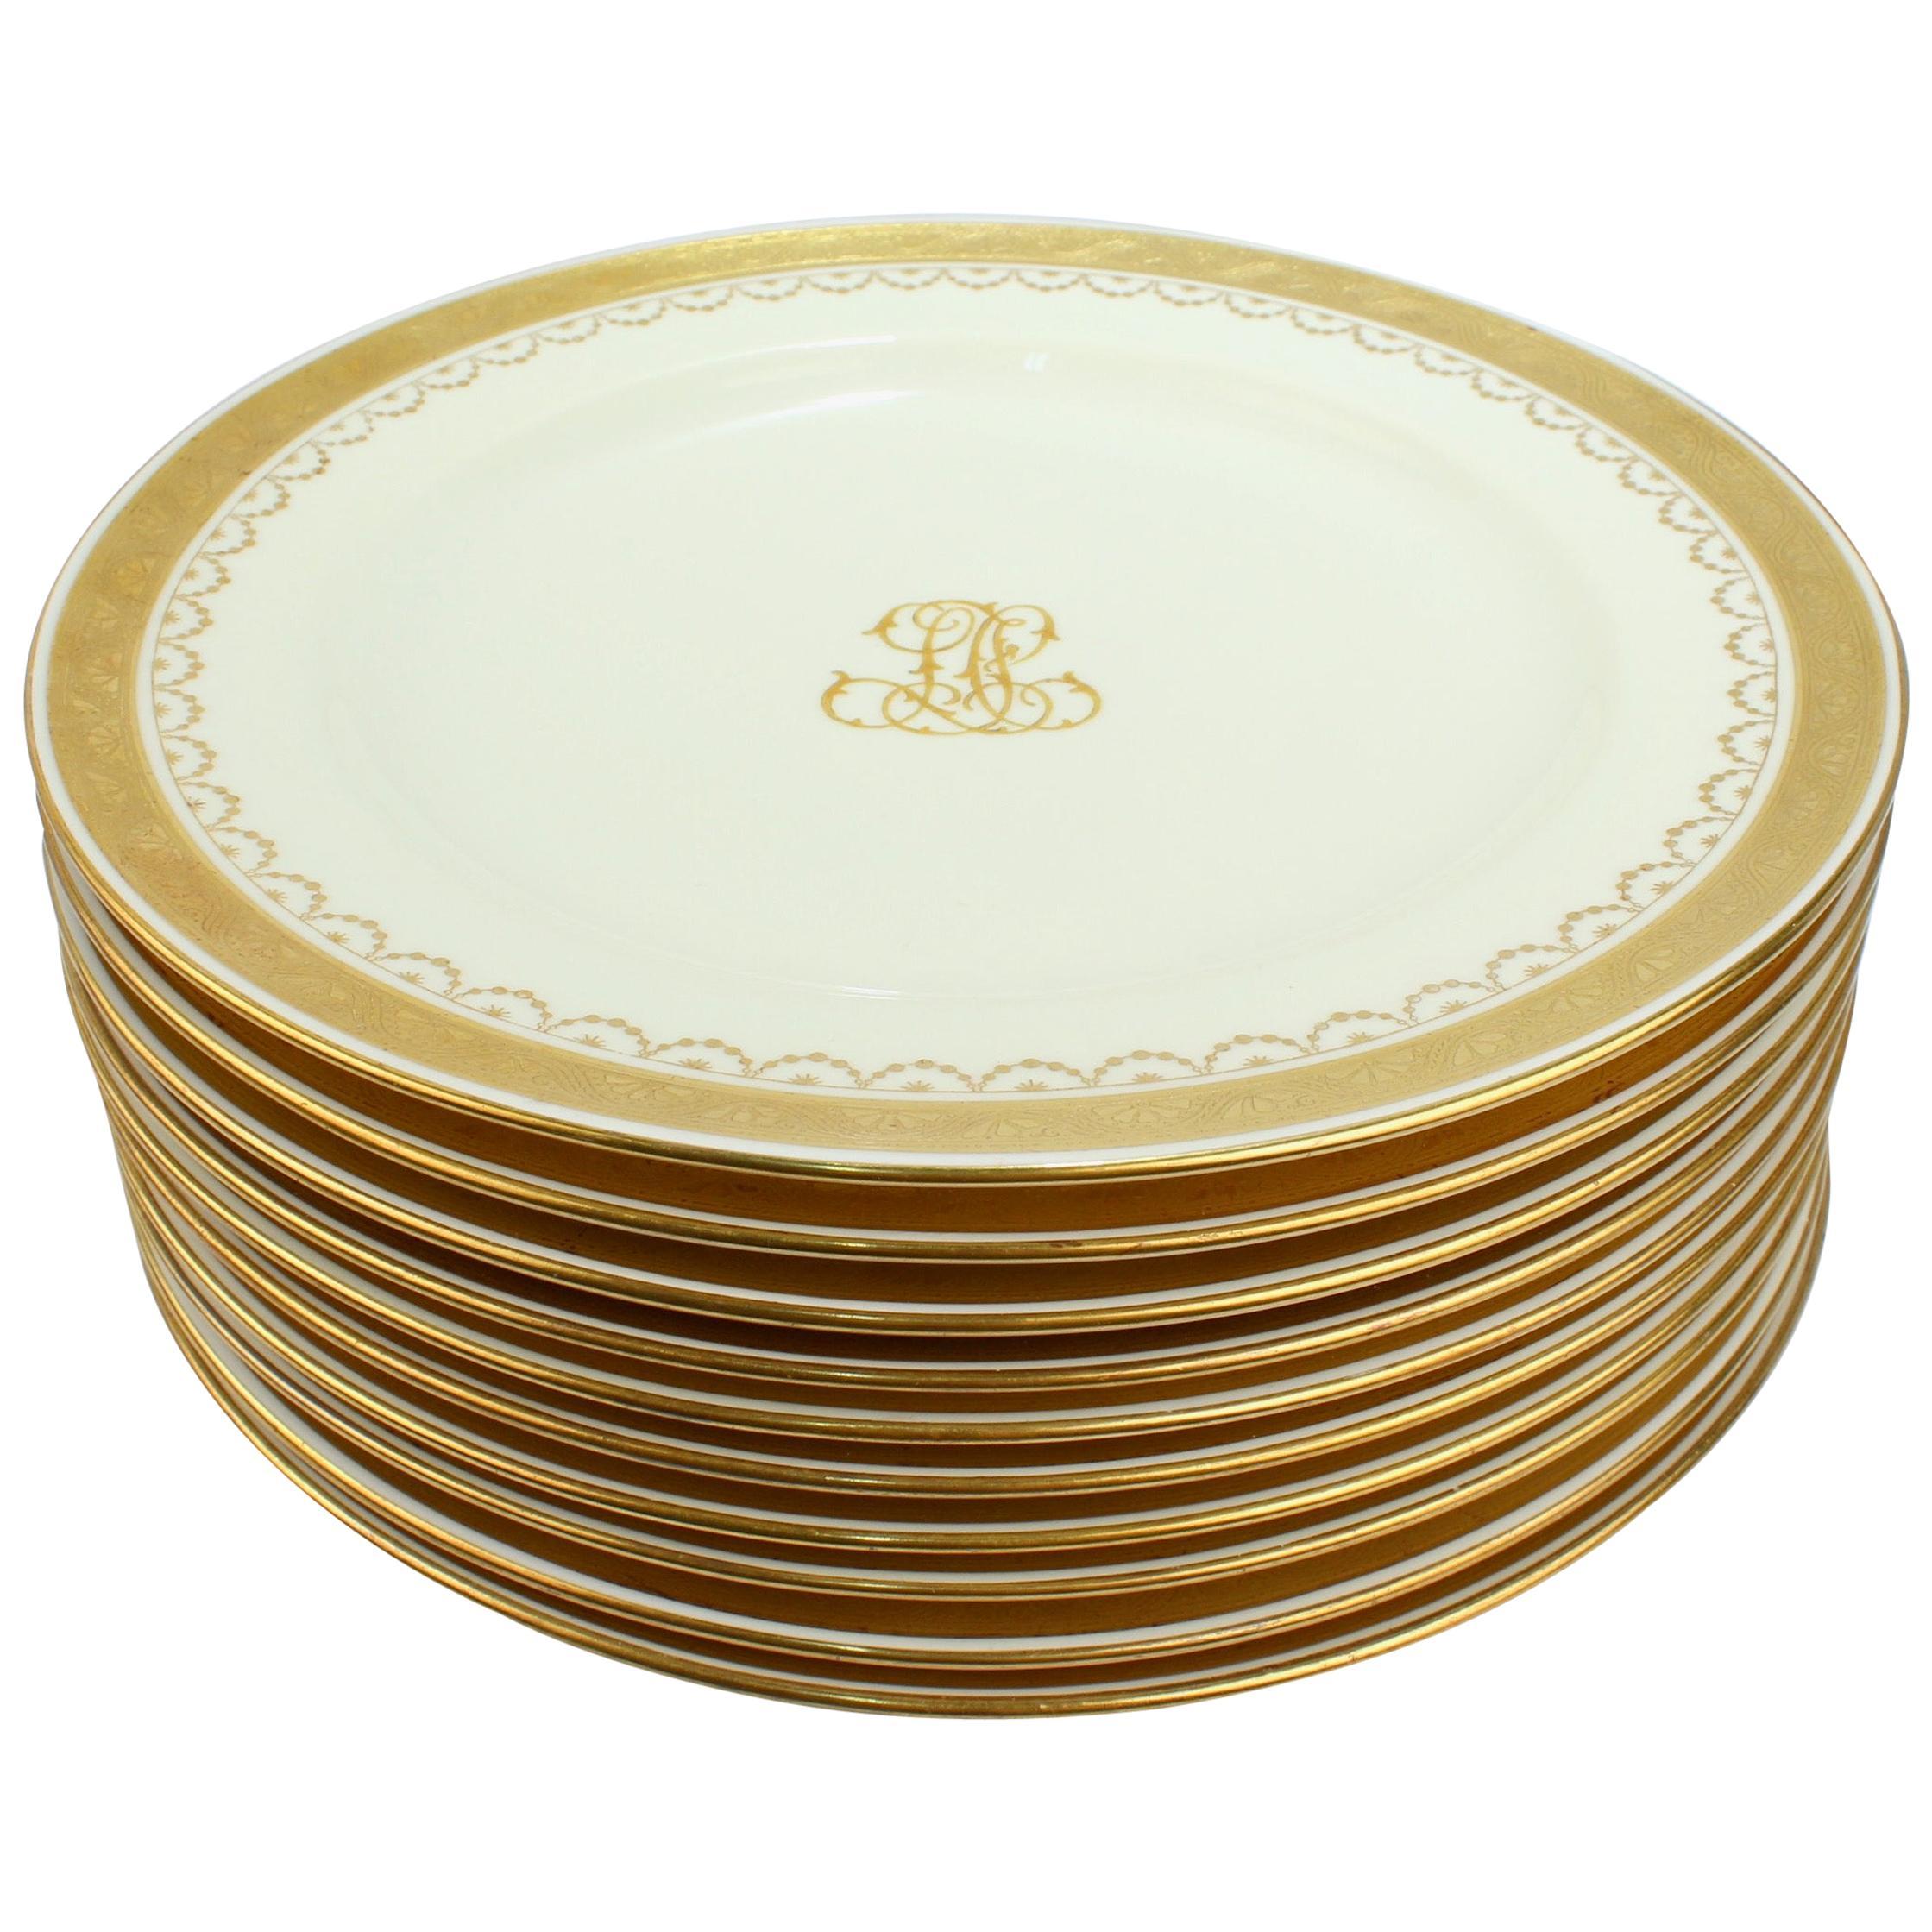 Set of 10 Antique Mintons Porcelain Gilt Bordered and Monogramed Dinner Plates